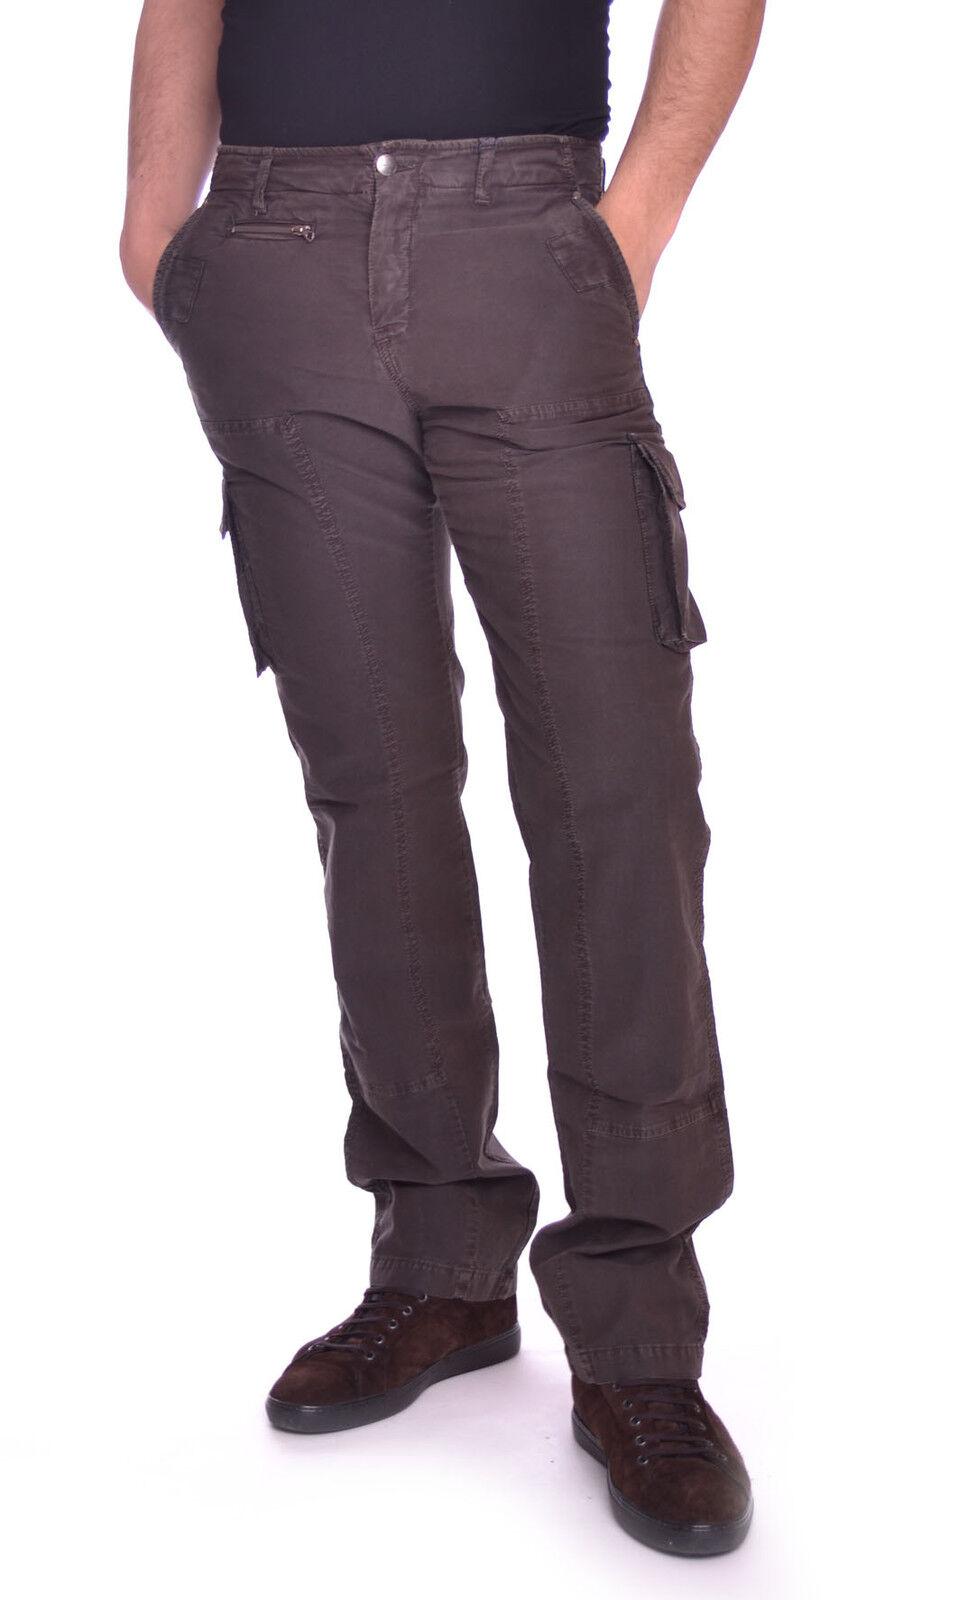 Pantalone men TRUSSARDI JEANS Men's Pant 32 (46) 526794  SCONTO -60%